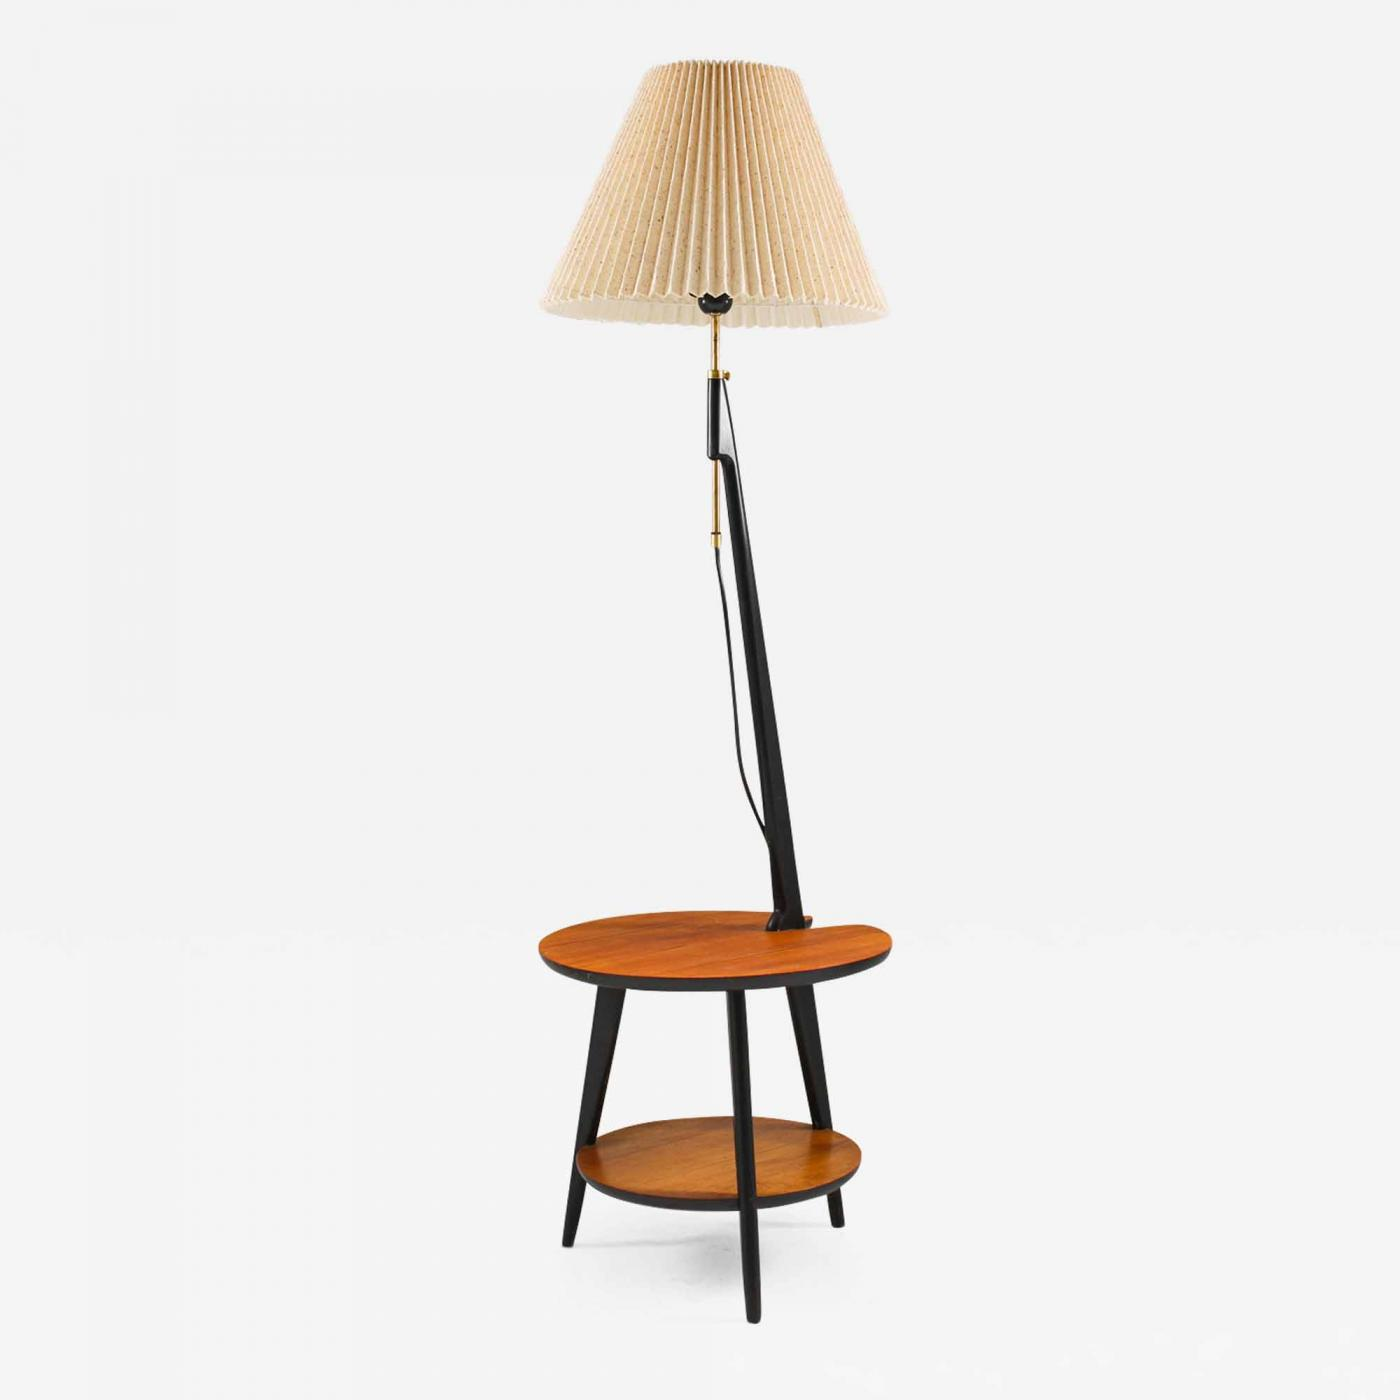 Anf Nybro Scandinavian Midcentury Floor Lamp Lamp Table By Anf Nybro Sweden